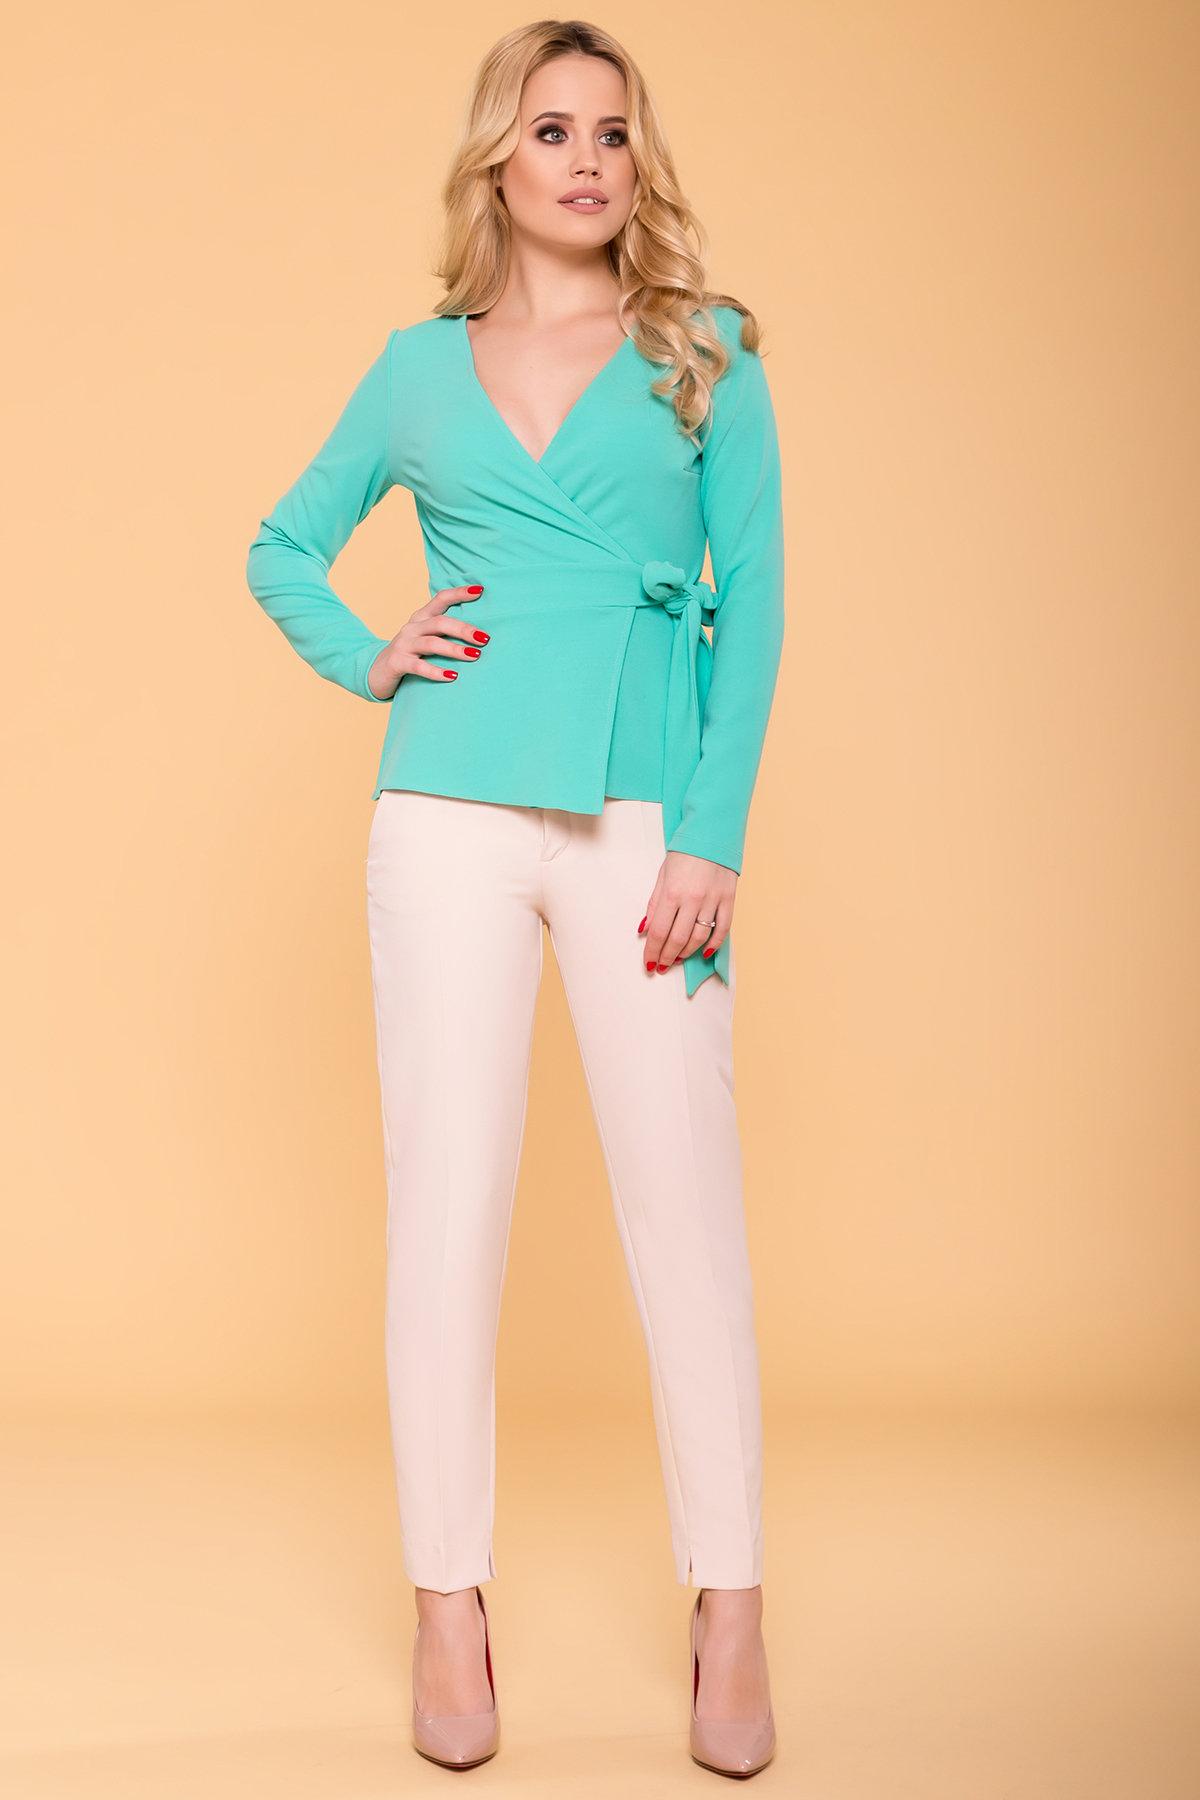 Купить блузки от Modus Блуза  Марсо 6432